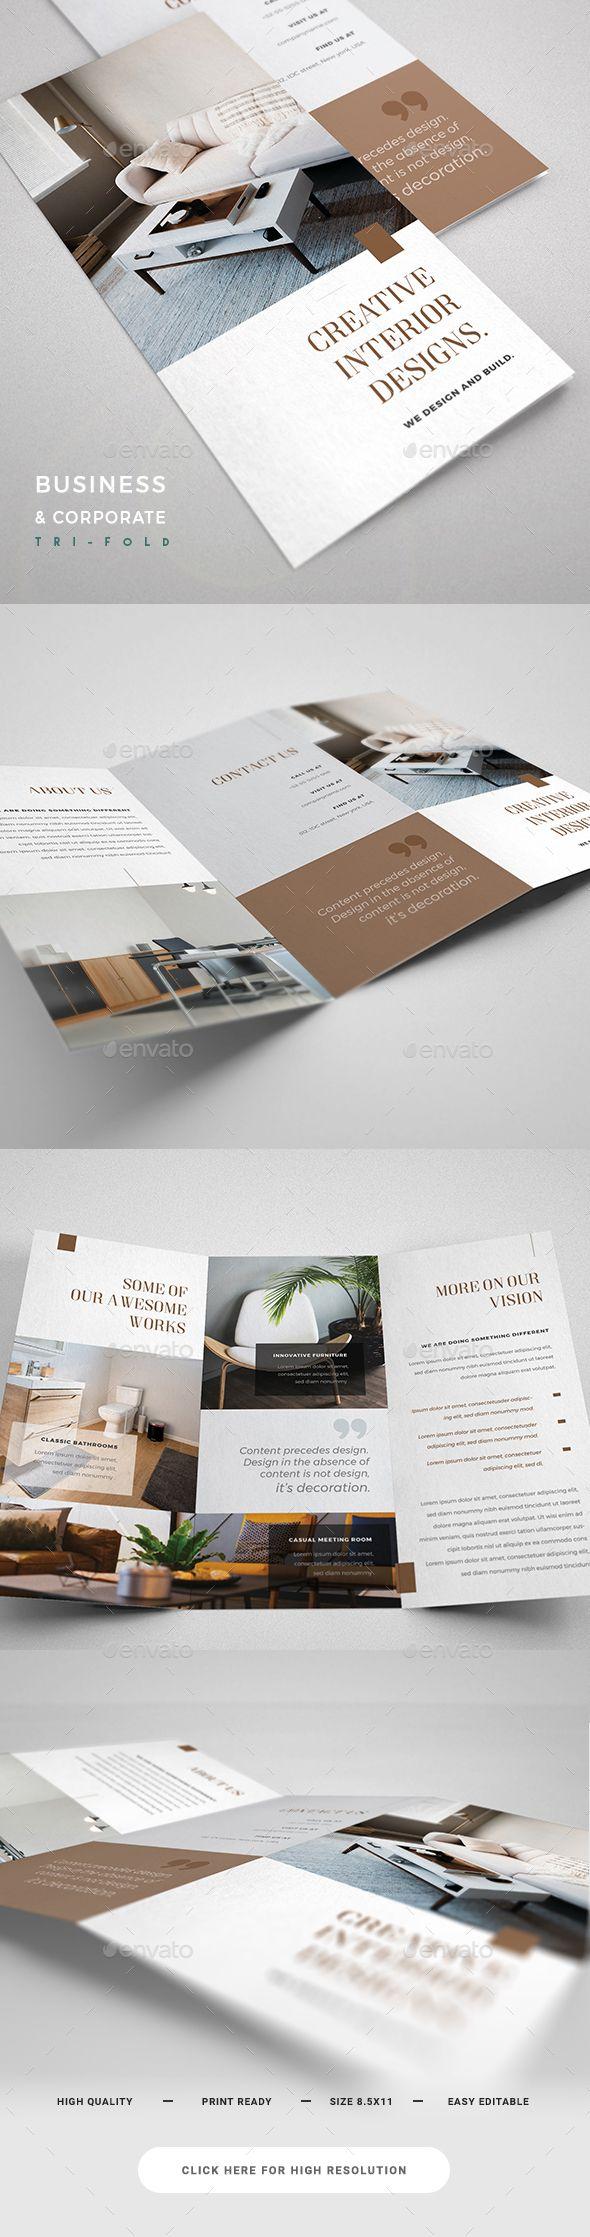 Interior Design Trifold Brochure Template Psd Download Https Graphicriver Net Item Interi Brochure Design Corporate Brochure Design Architecture Brochures